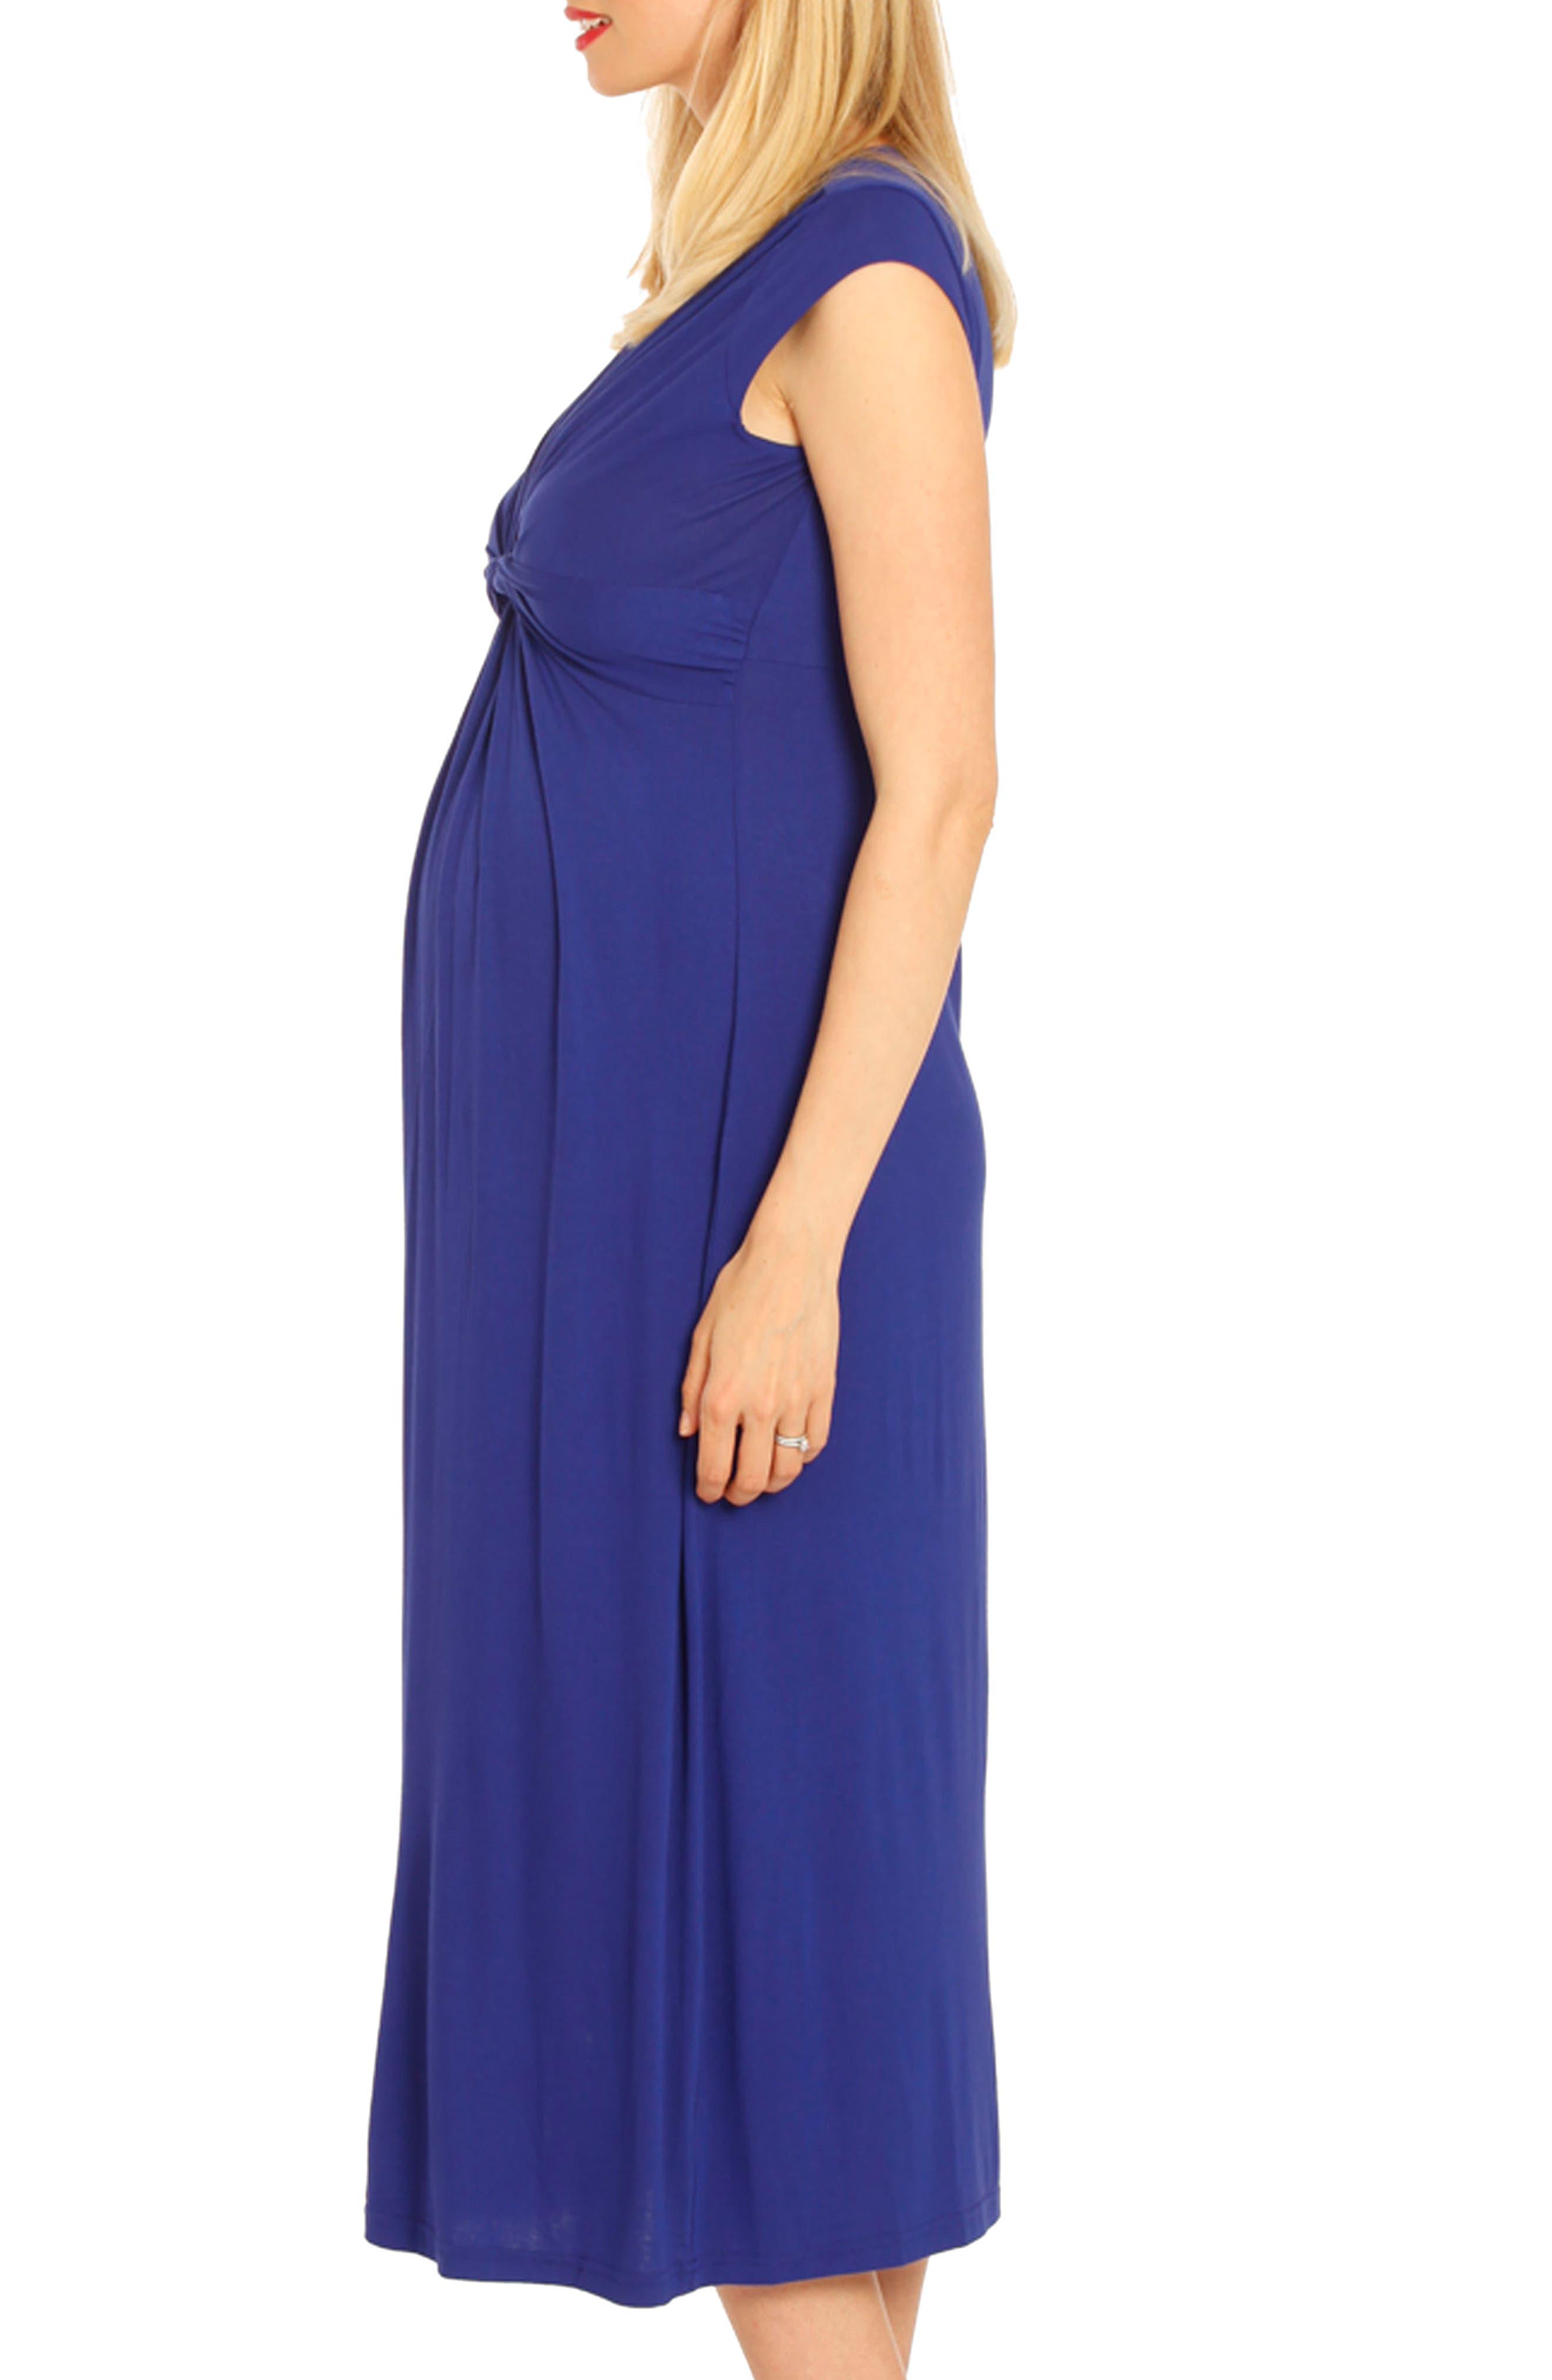 Knot Front Maternity Dress,                             Alternate thumbnail 3, color,                             400